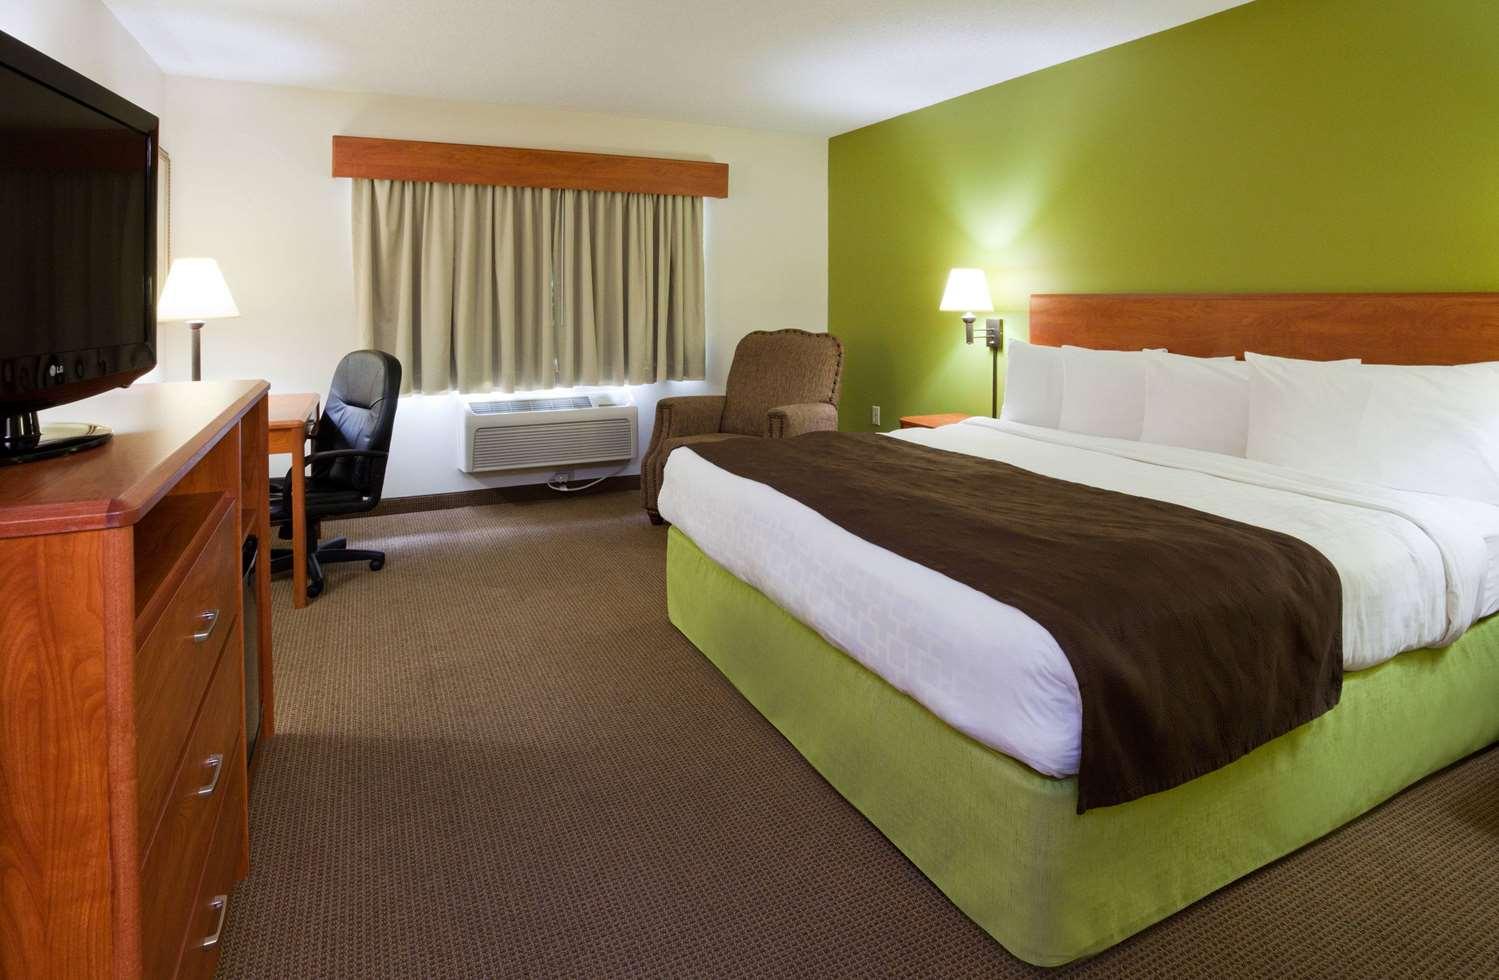 Room - AmericInn Lodge & Suites Thief River Falls